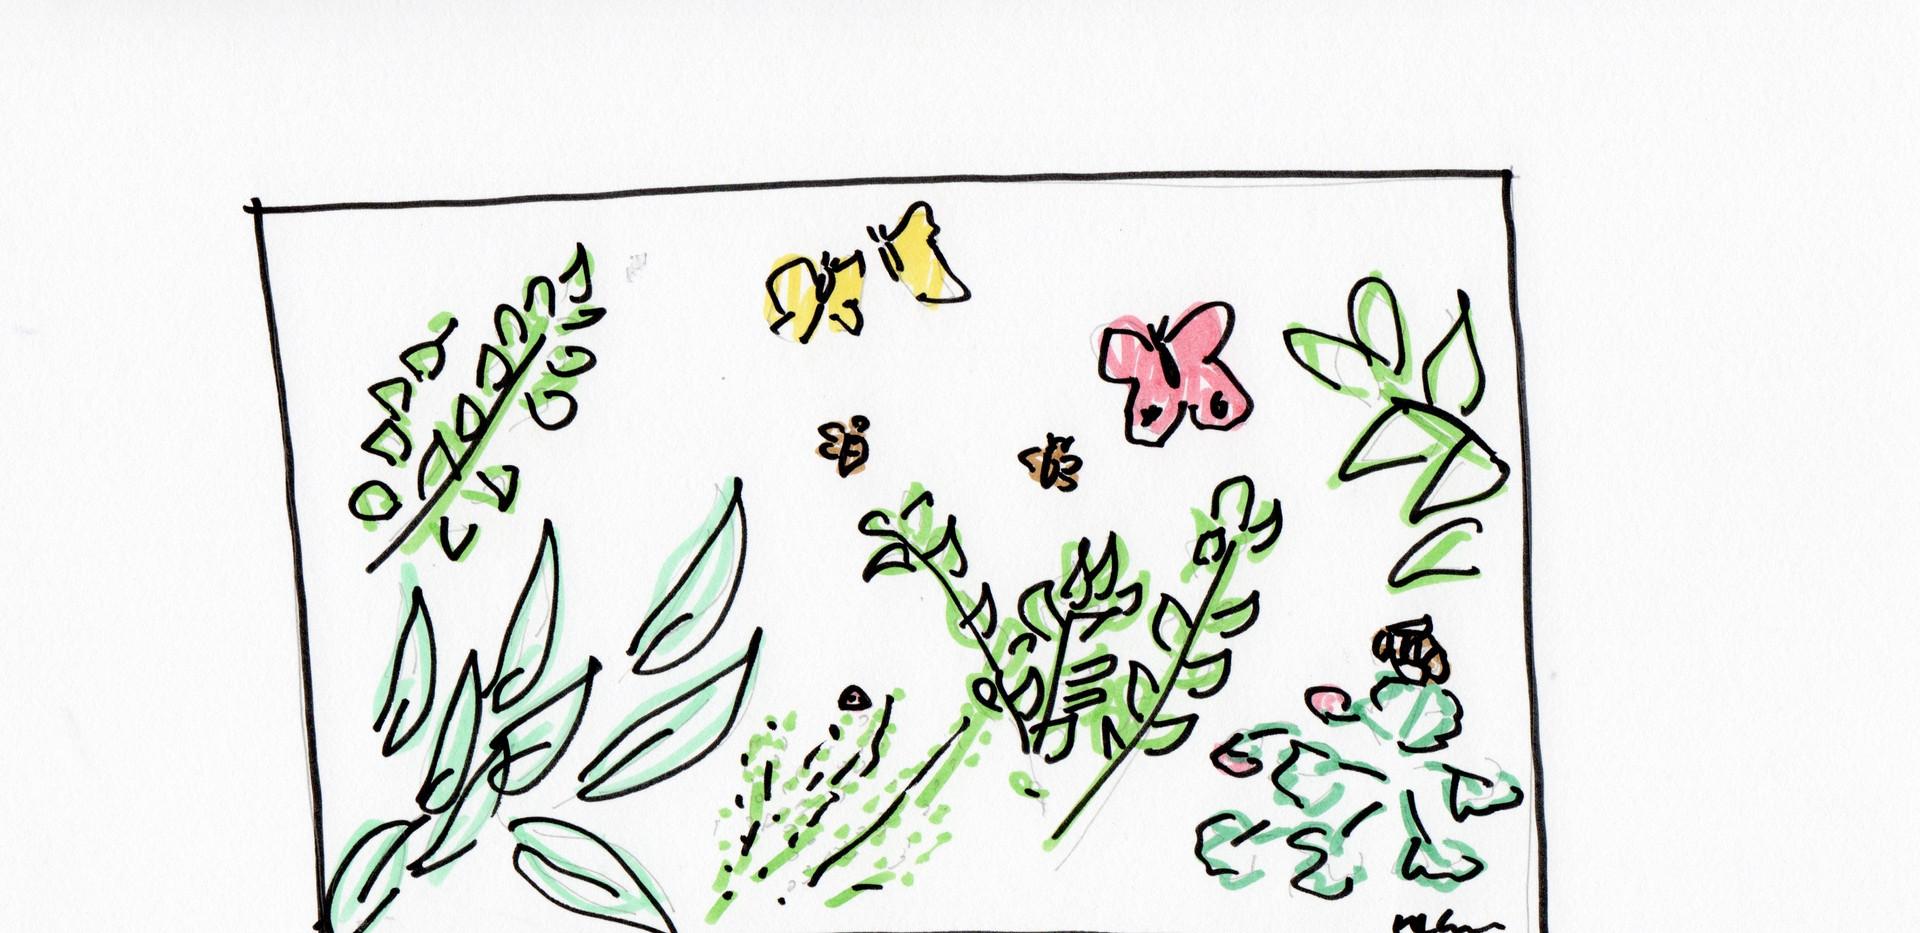 Orttradgard sketch .jpeg